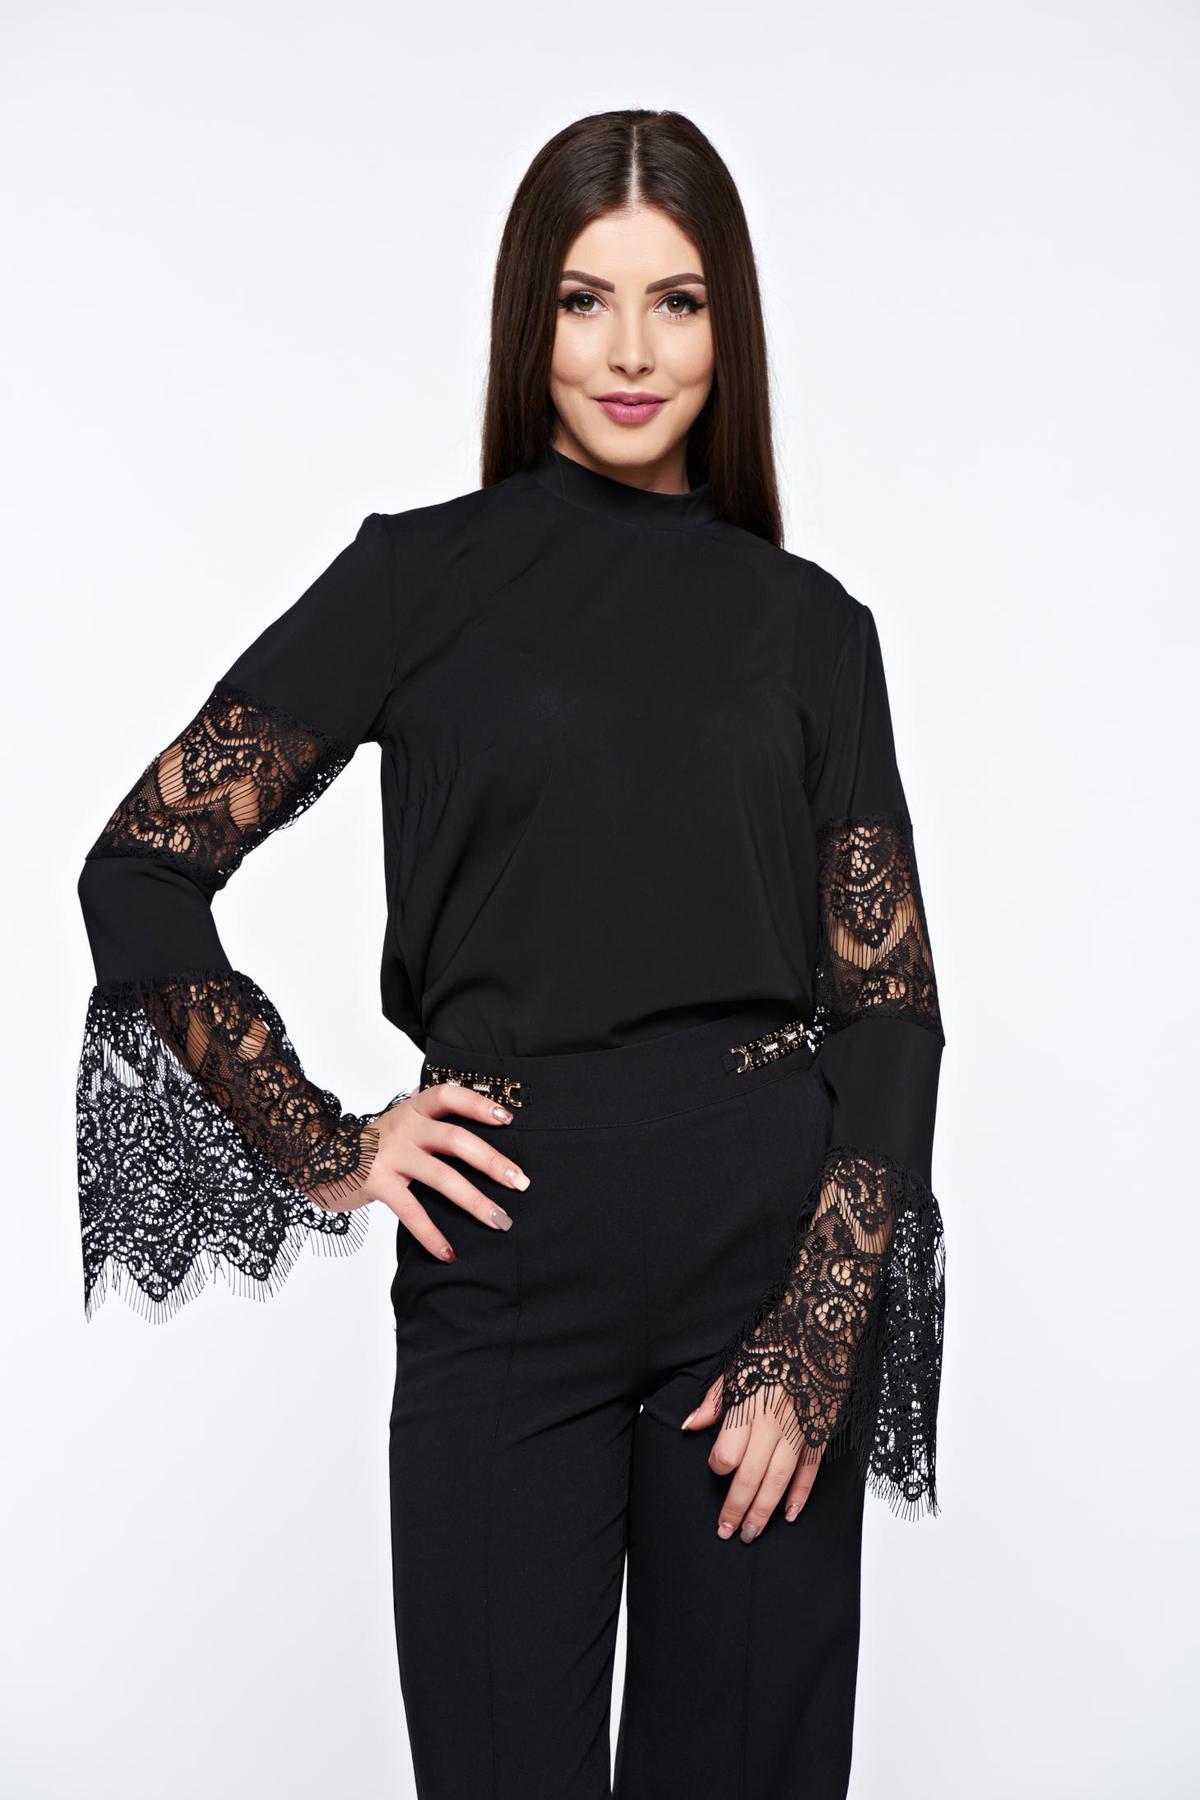 Bluza Dama Starshiners Neagra Eleganta Cu Croi Larg Din Material Fin La Atingere Cu Maneci Clopot Din Dantela